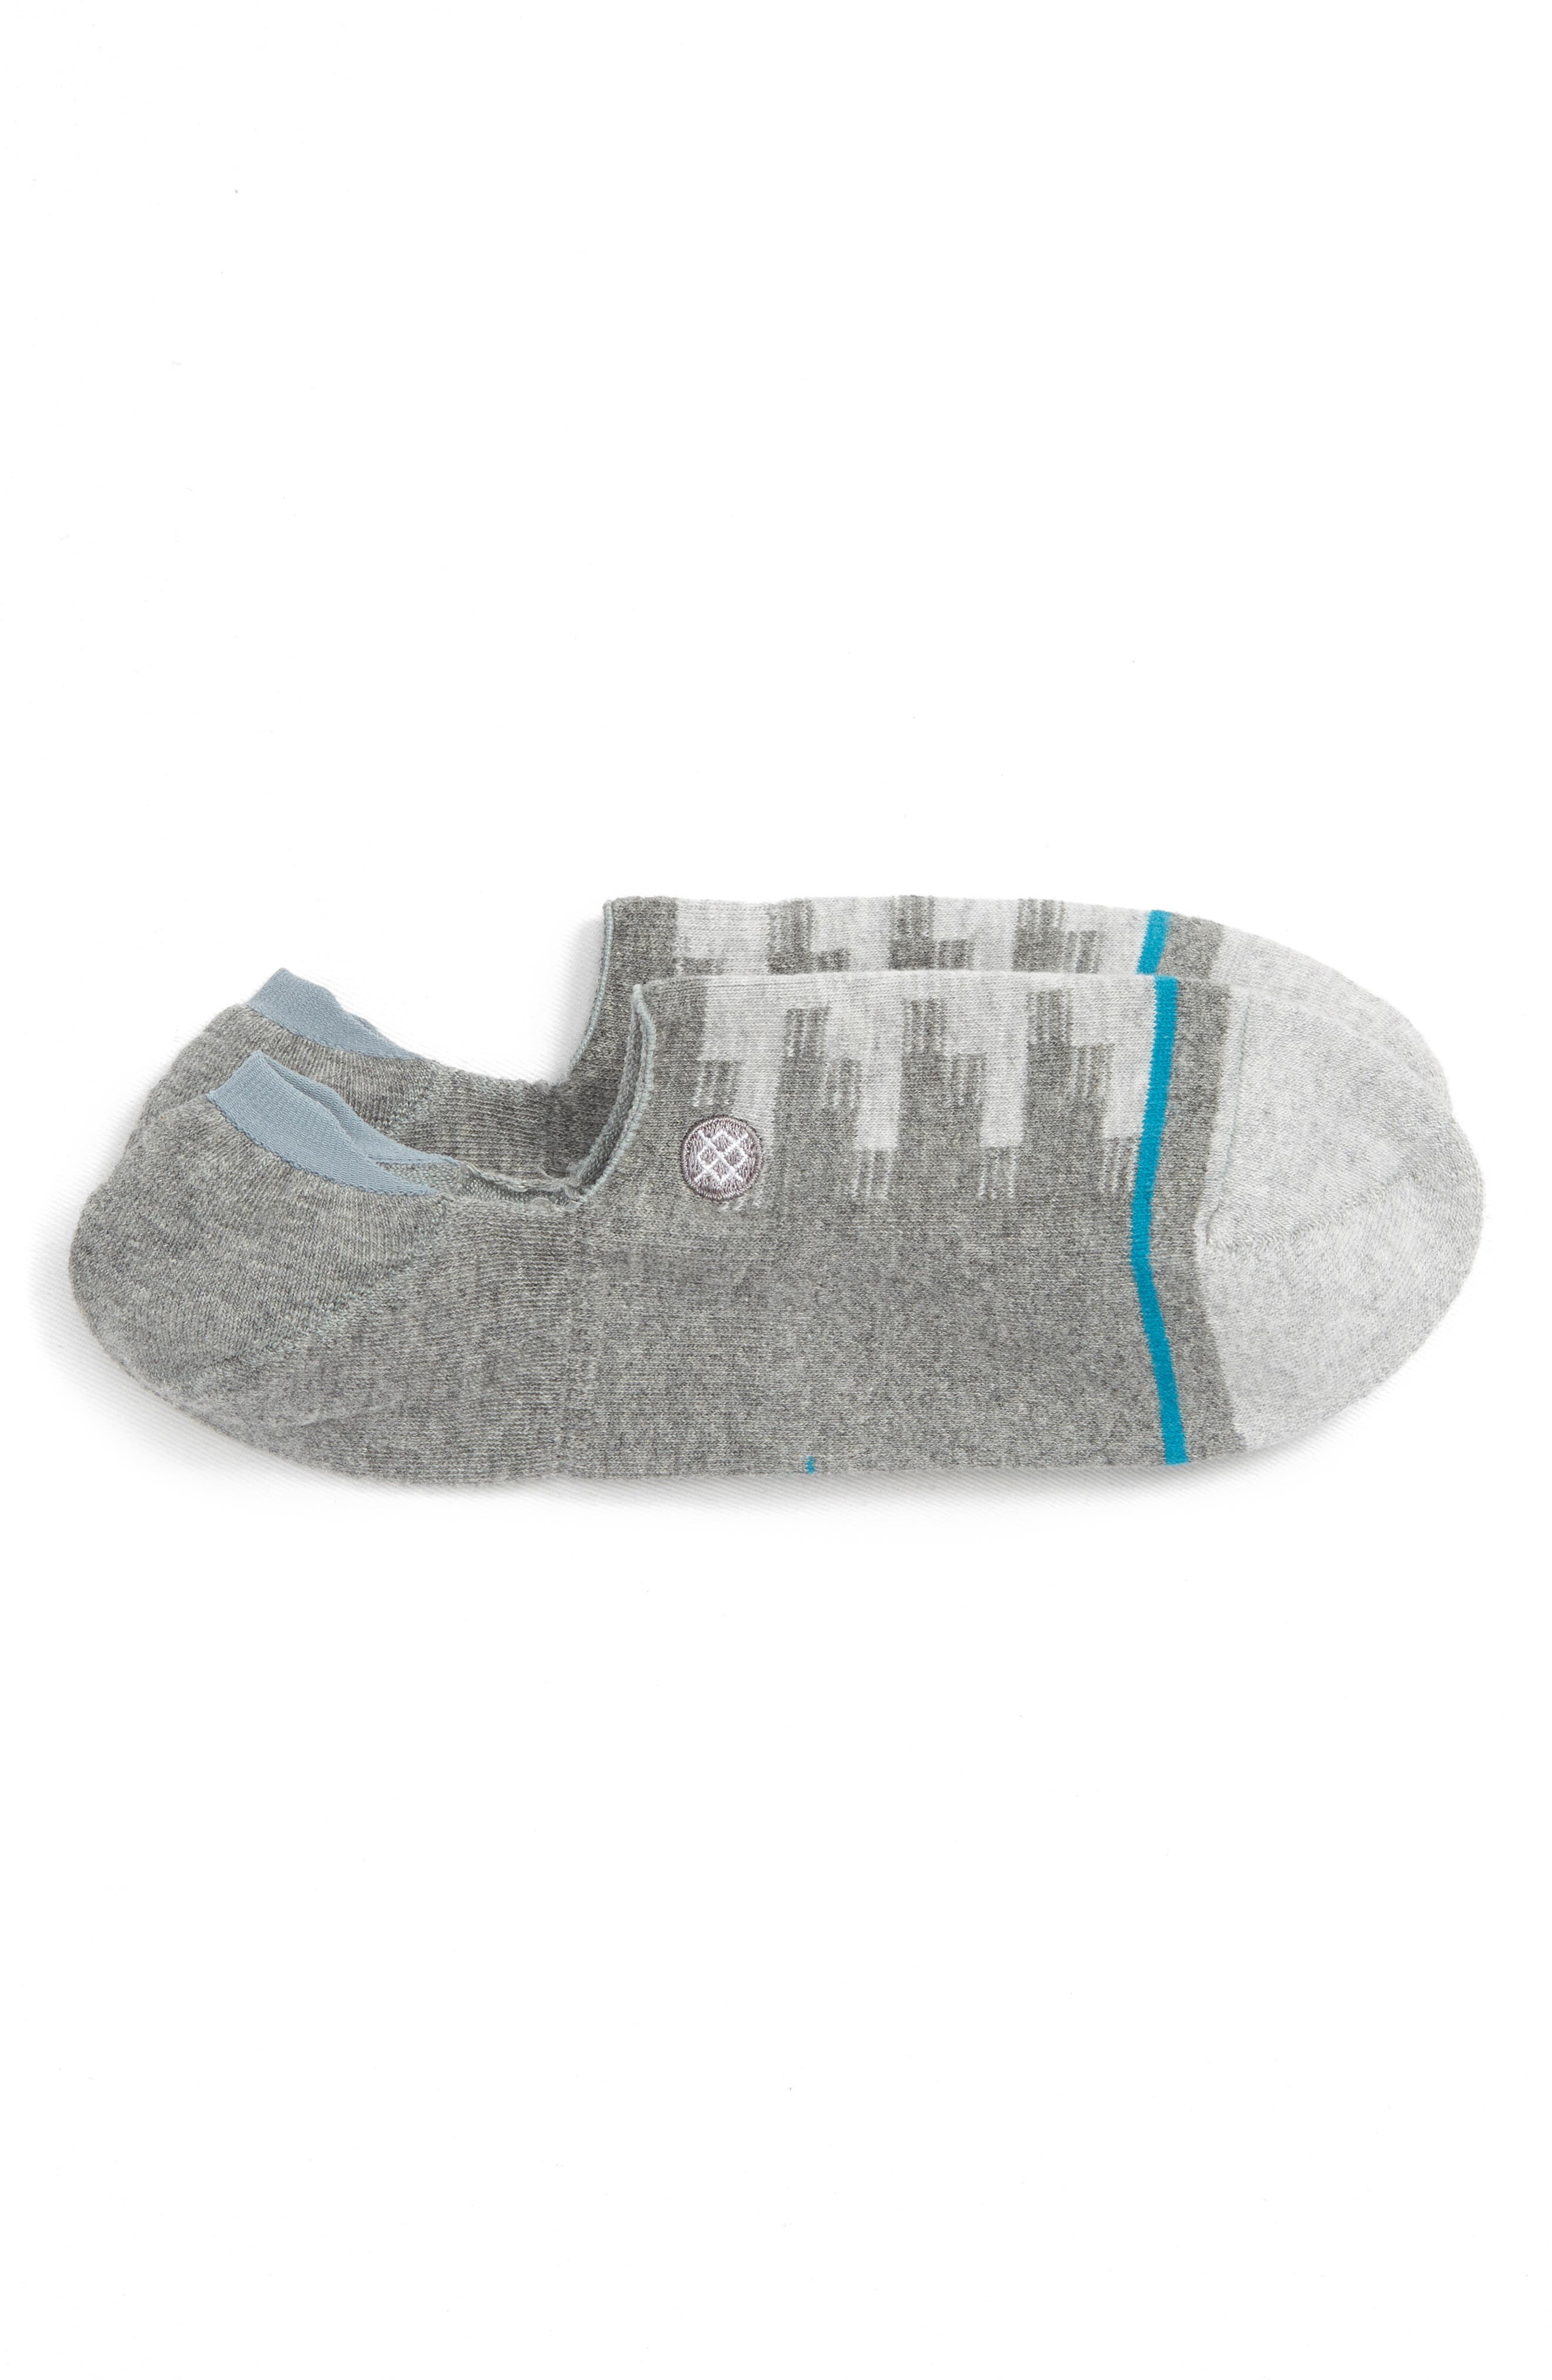 Laretto No-Show Socks,                             Main thumbnail 1, color,                             GREY